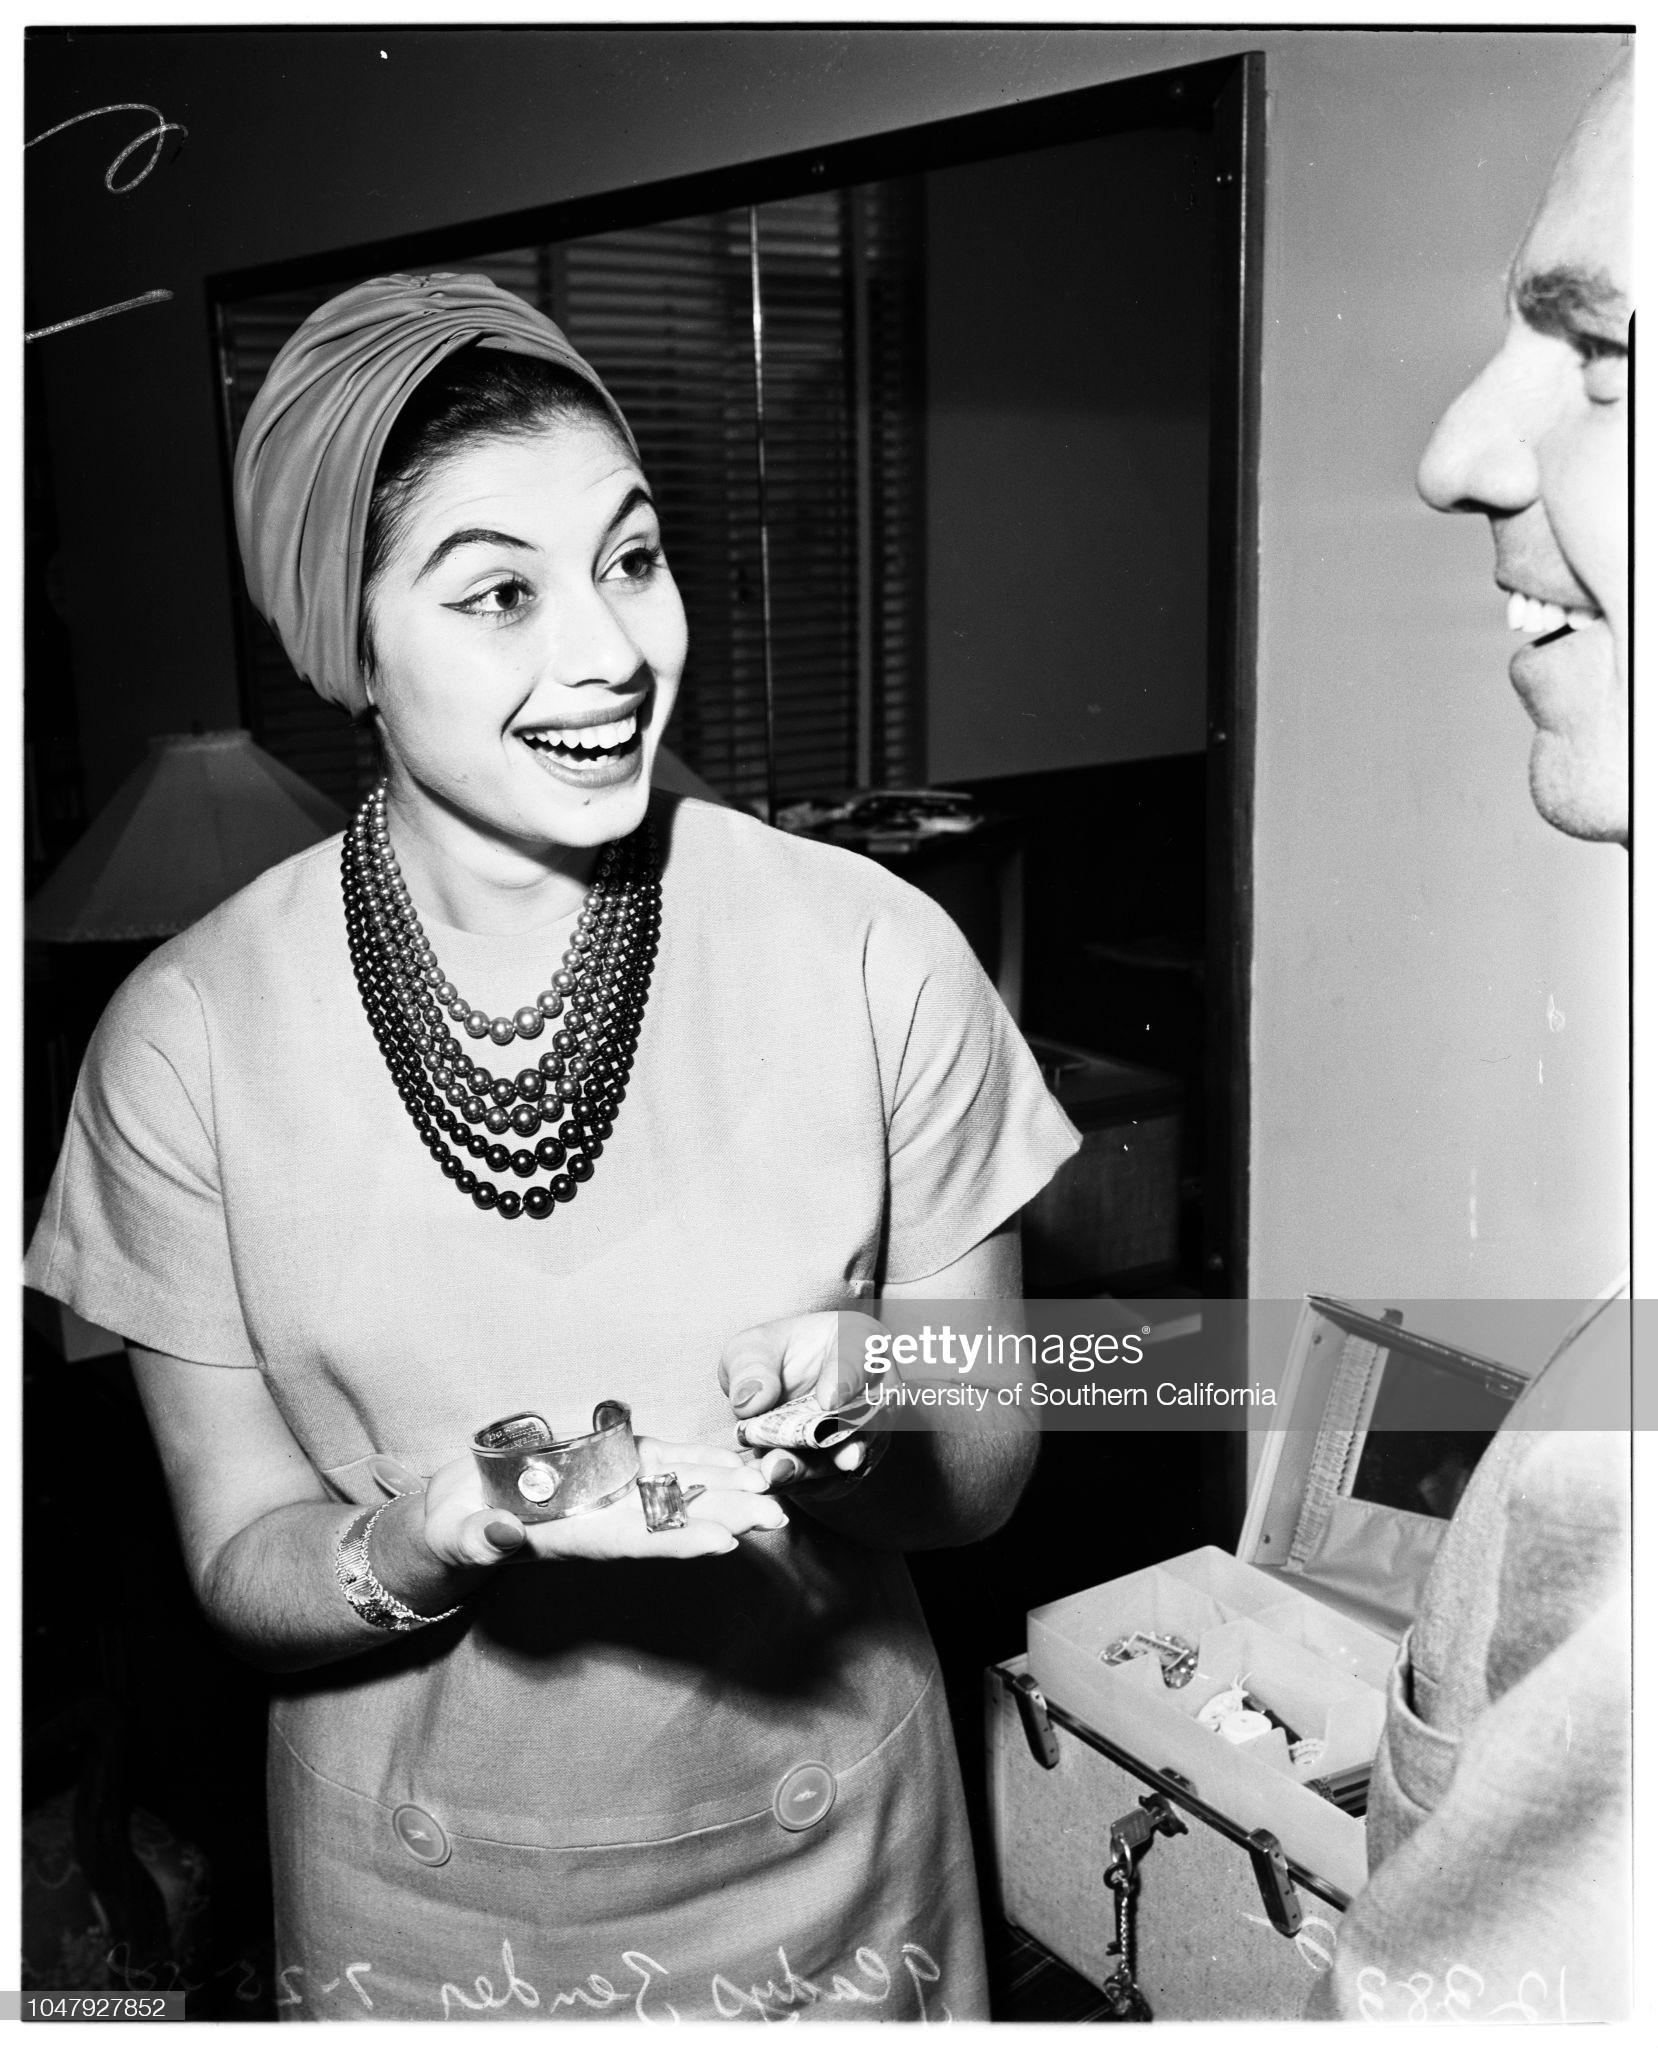 gladys zender, miss universe 1957. primera latina a vencer este concurso. - Página 4 Rvuwba10